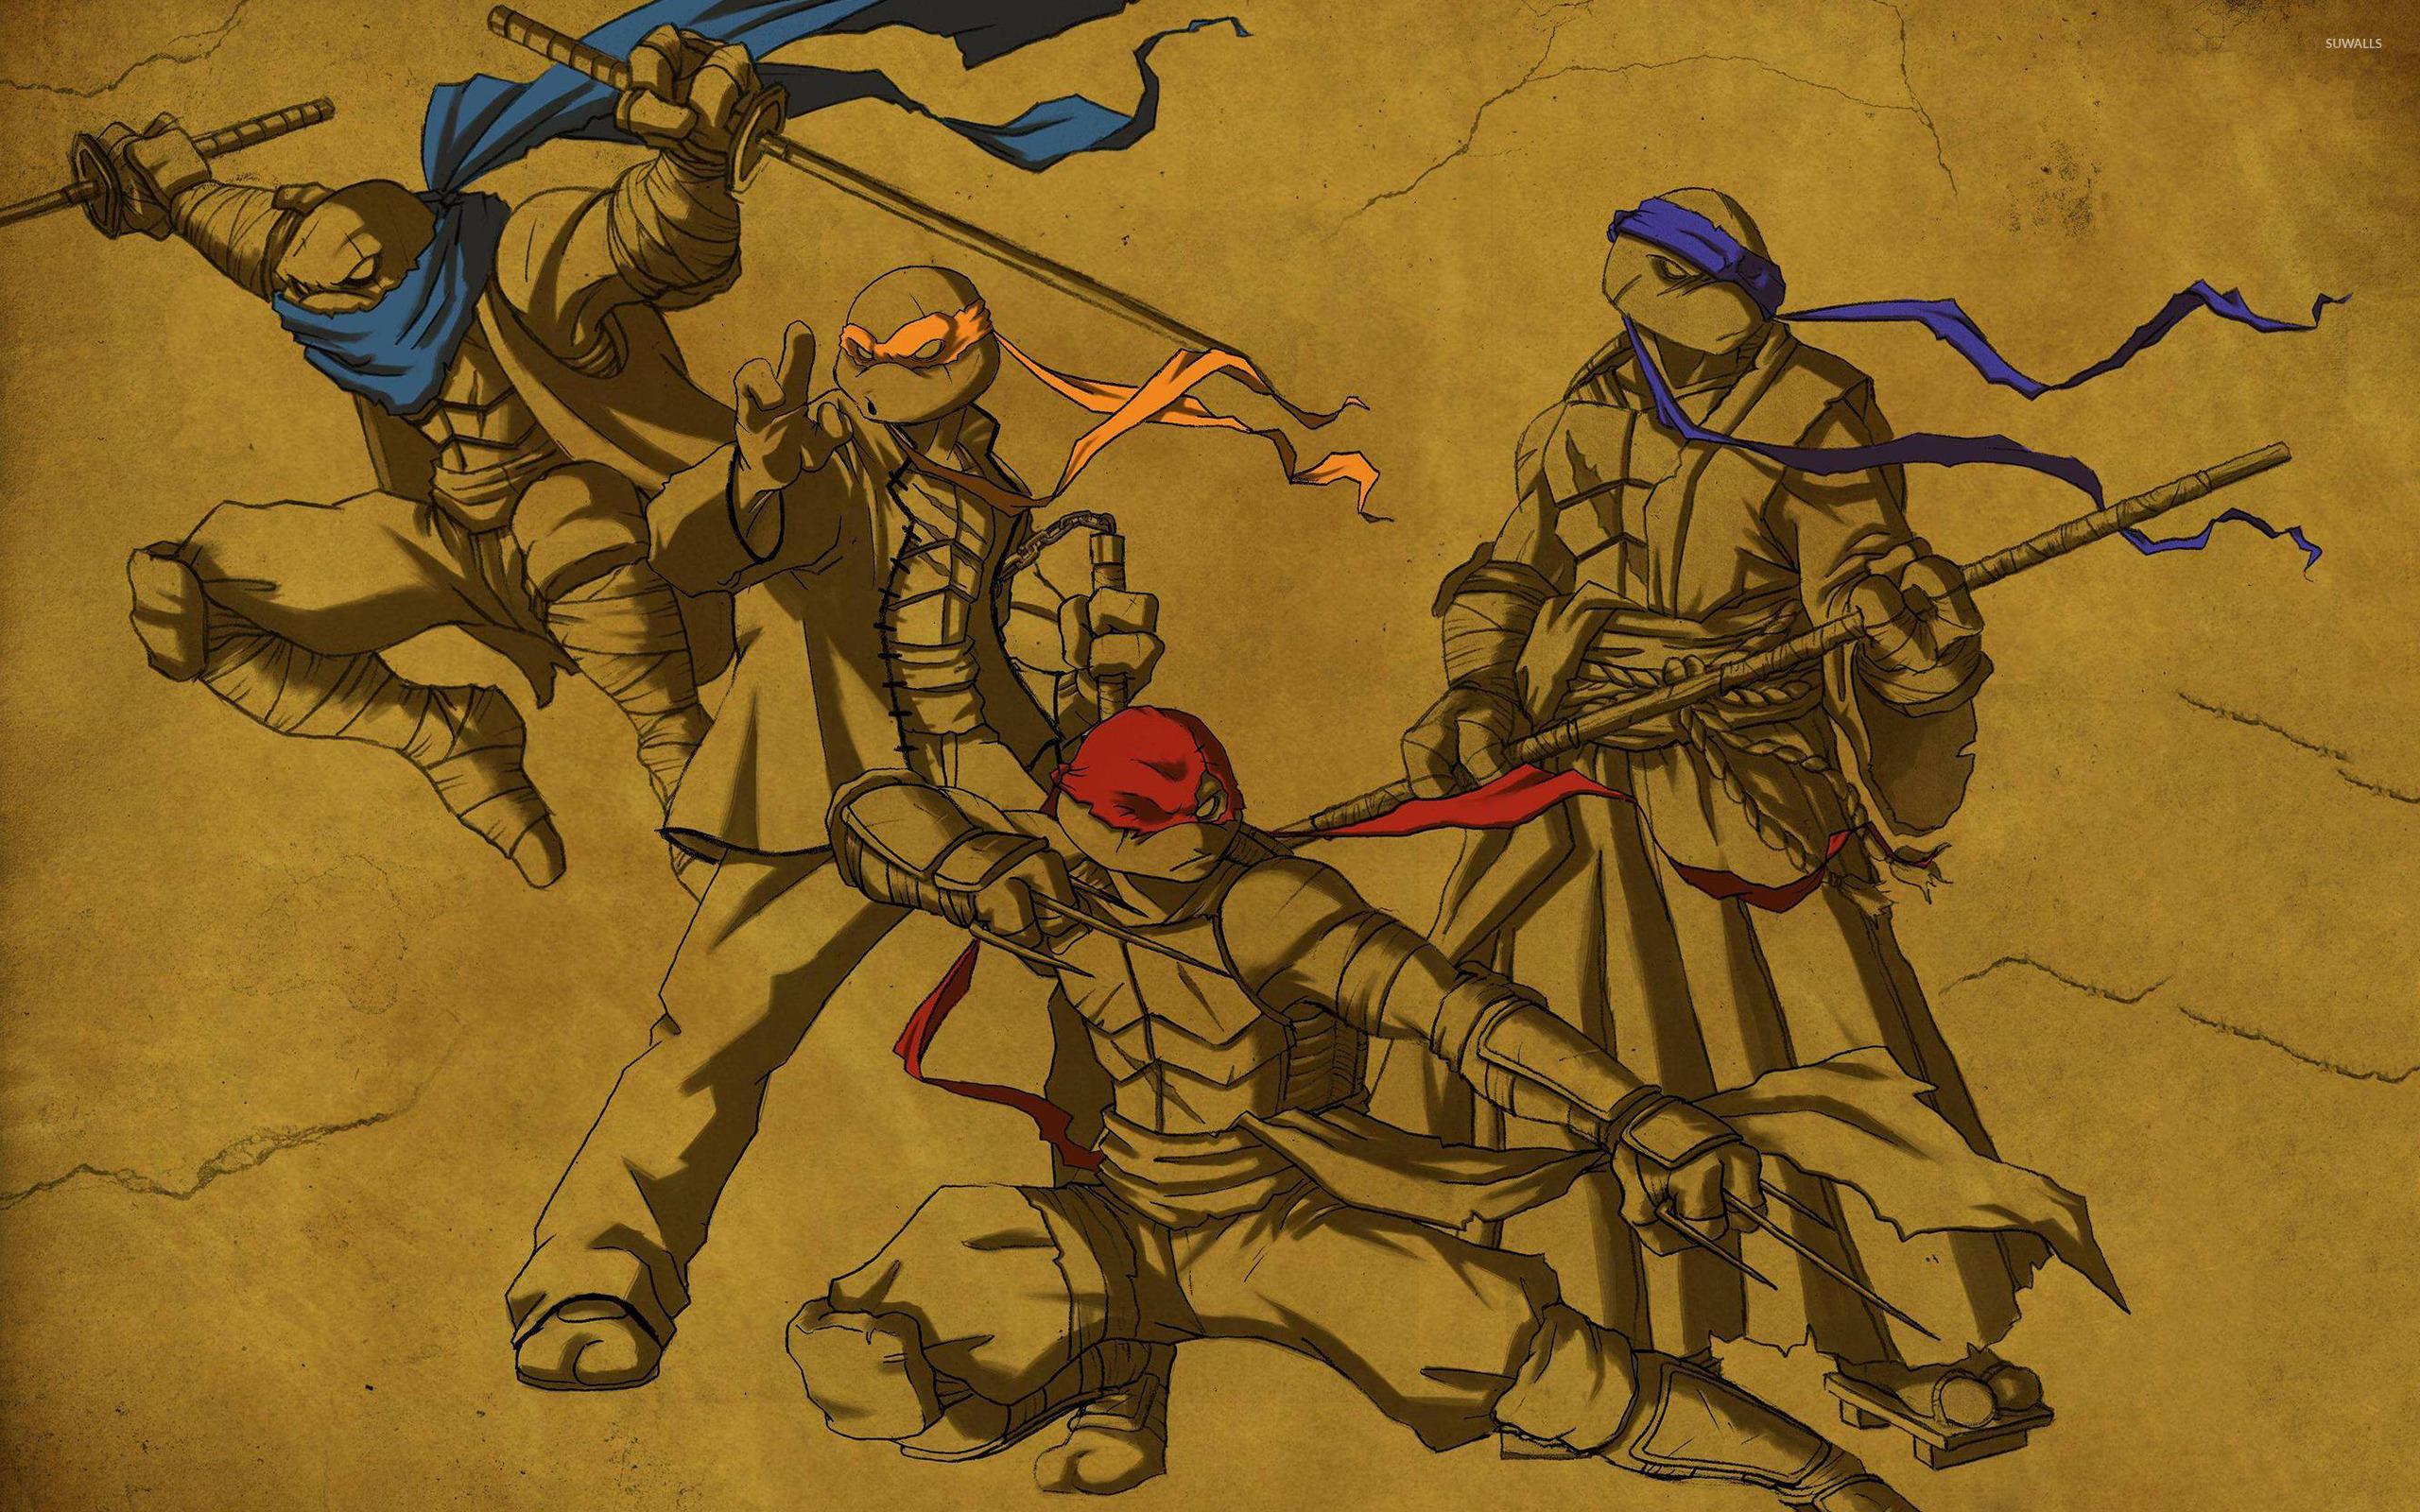 Teenage Mutant Ninja Turtles [3] wallpaper 2560x1600 jpg